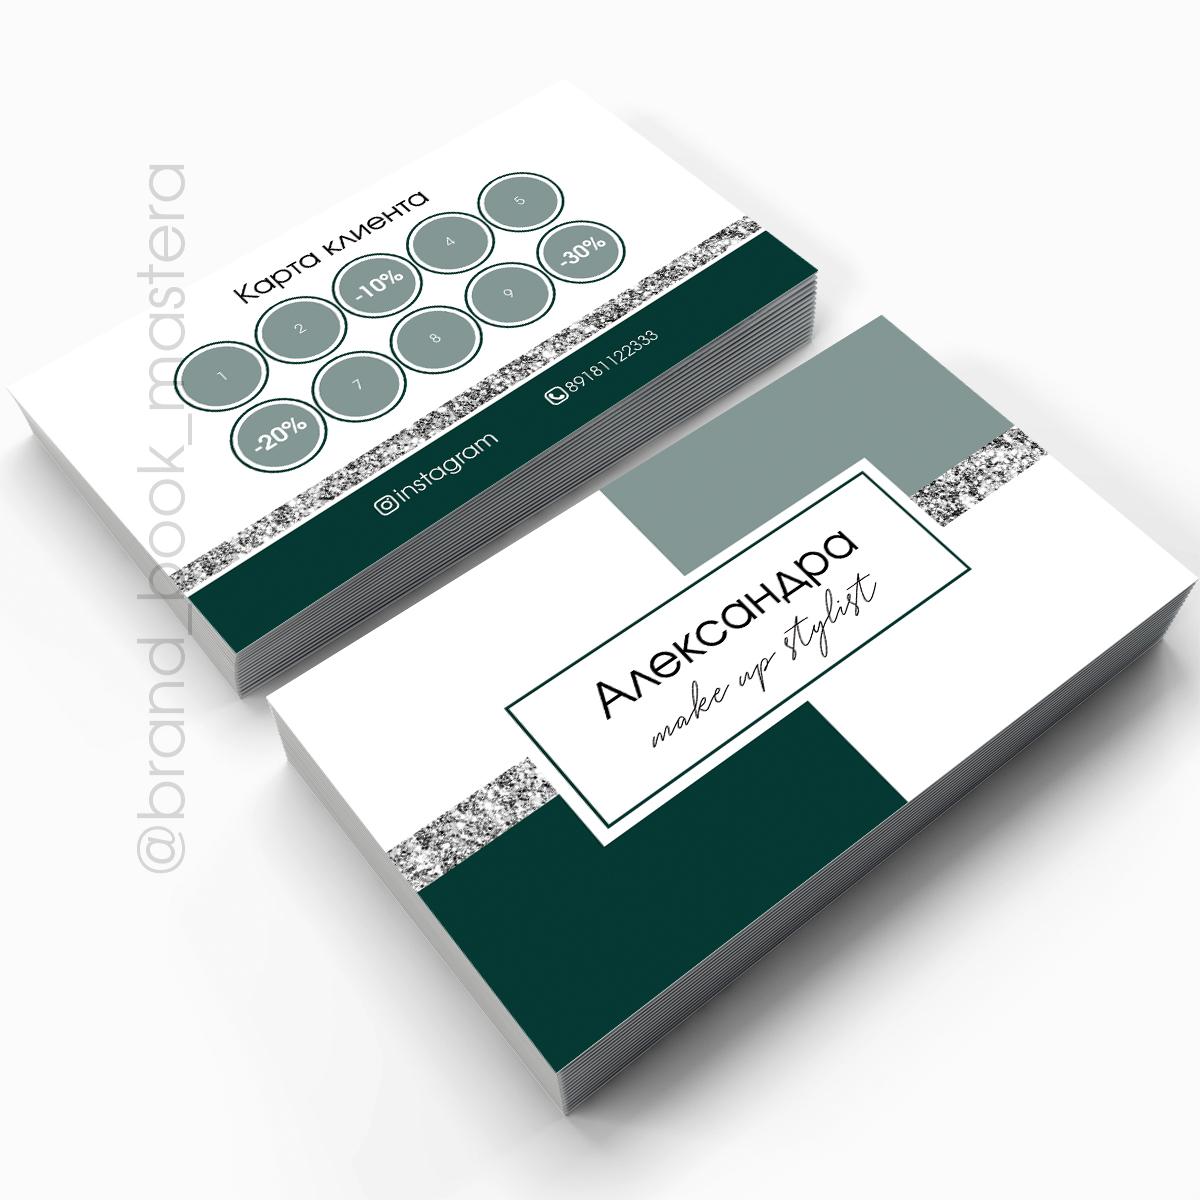 визиткас картой клиента